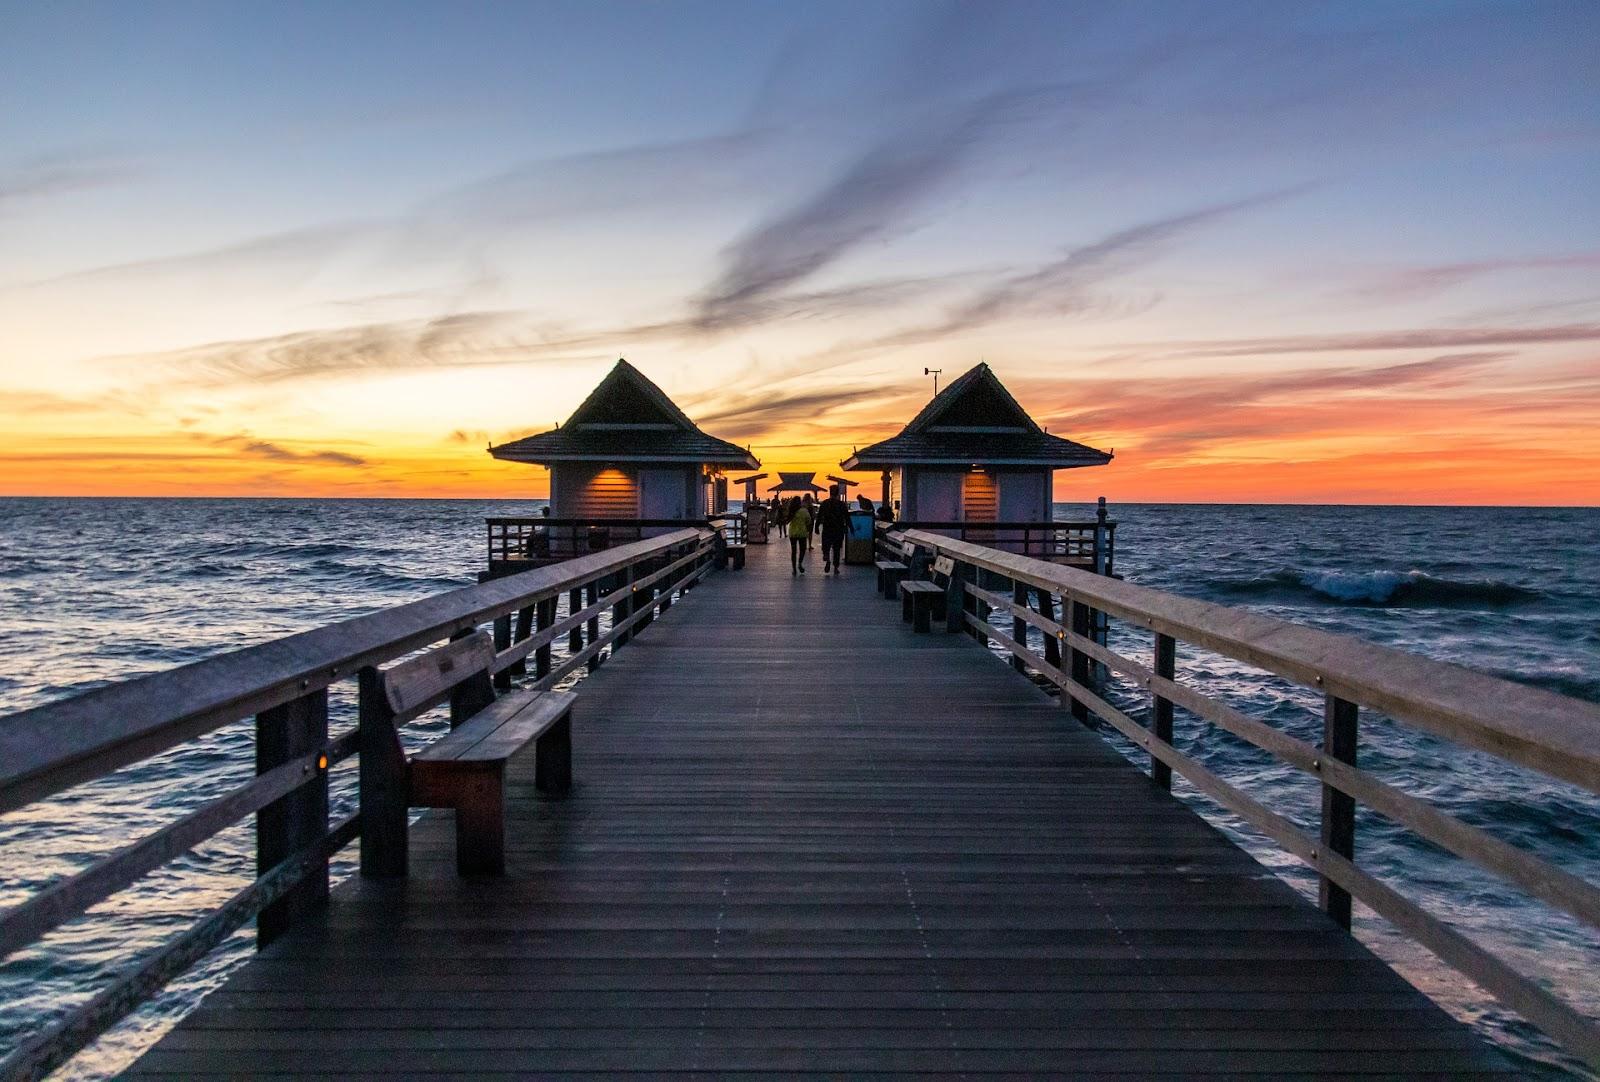 wooden pier atop blue wavy ocean during sunset in naples florida